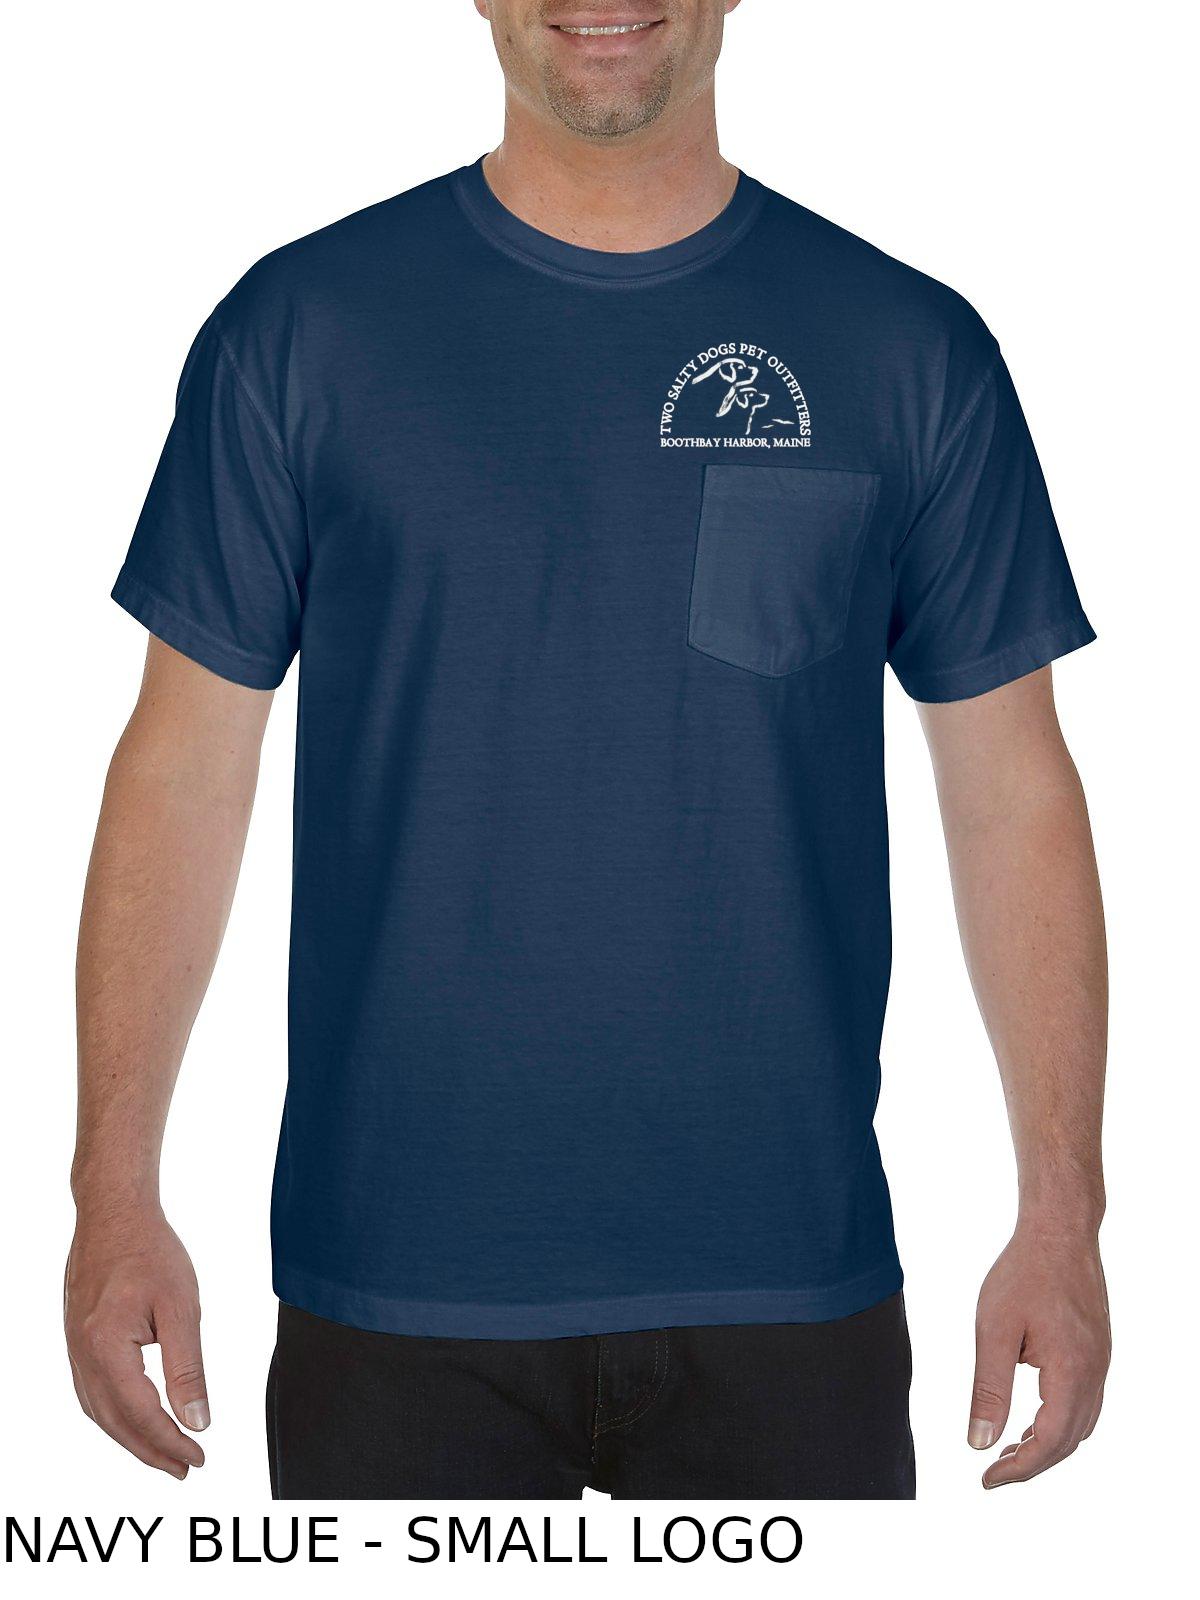 bbha-ss-t-shirt-pocket-navy-blue-front-small-logo